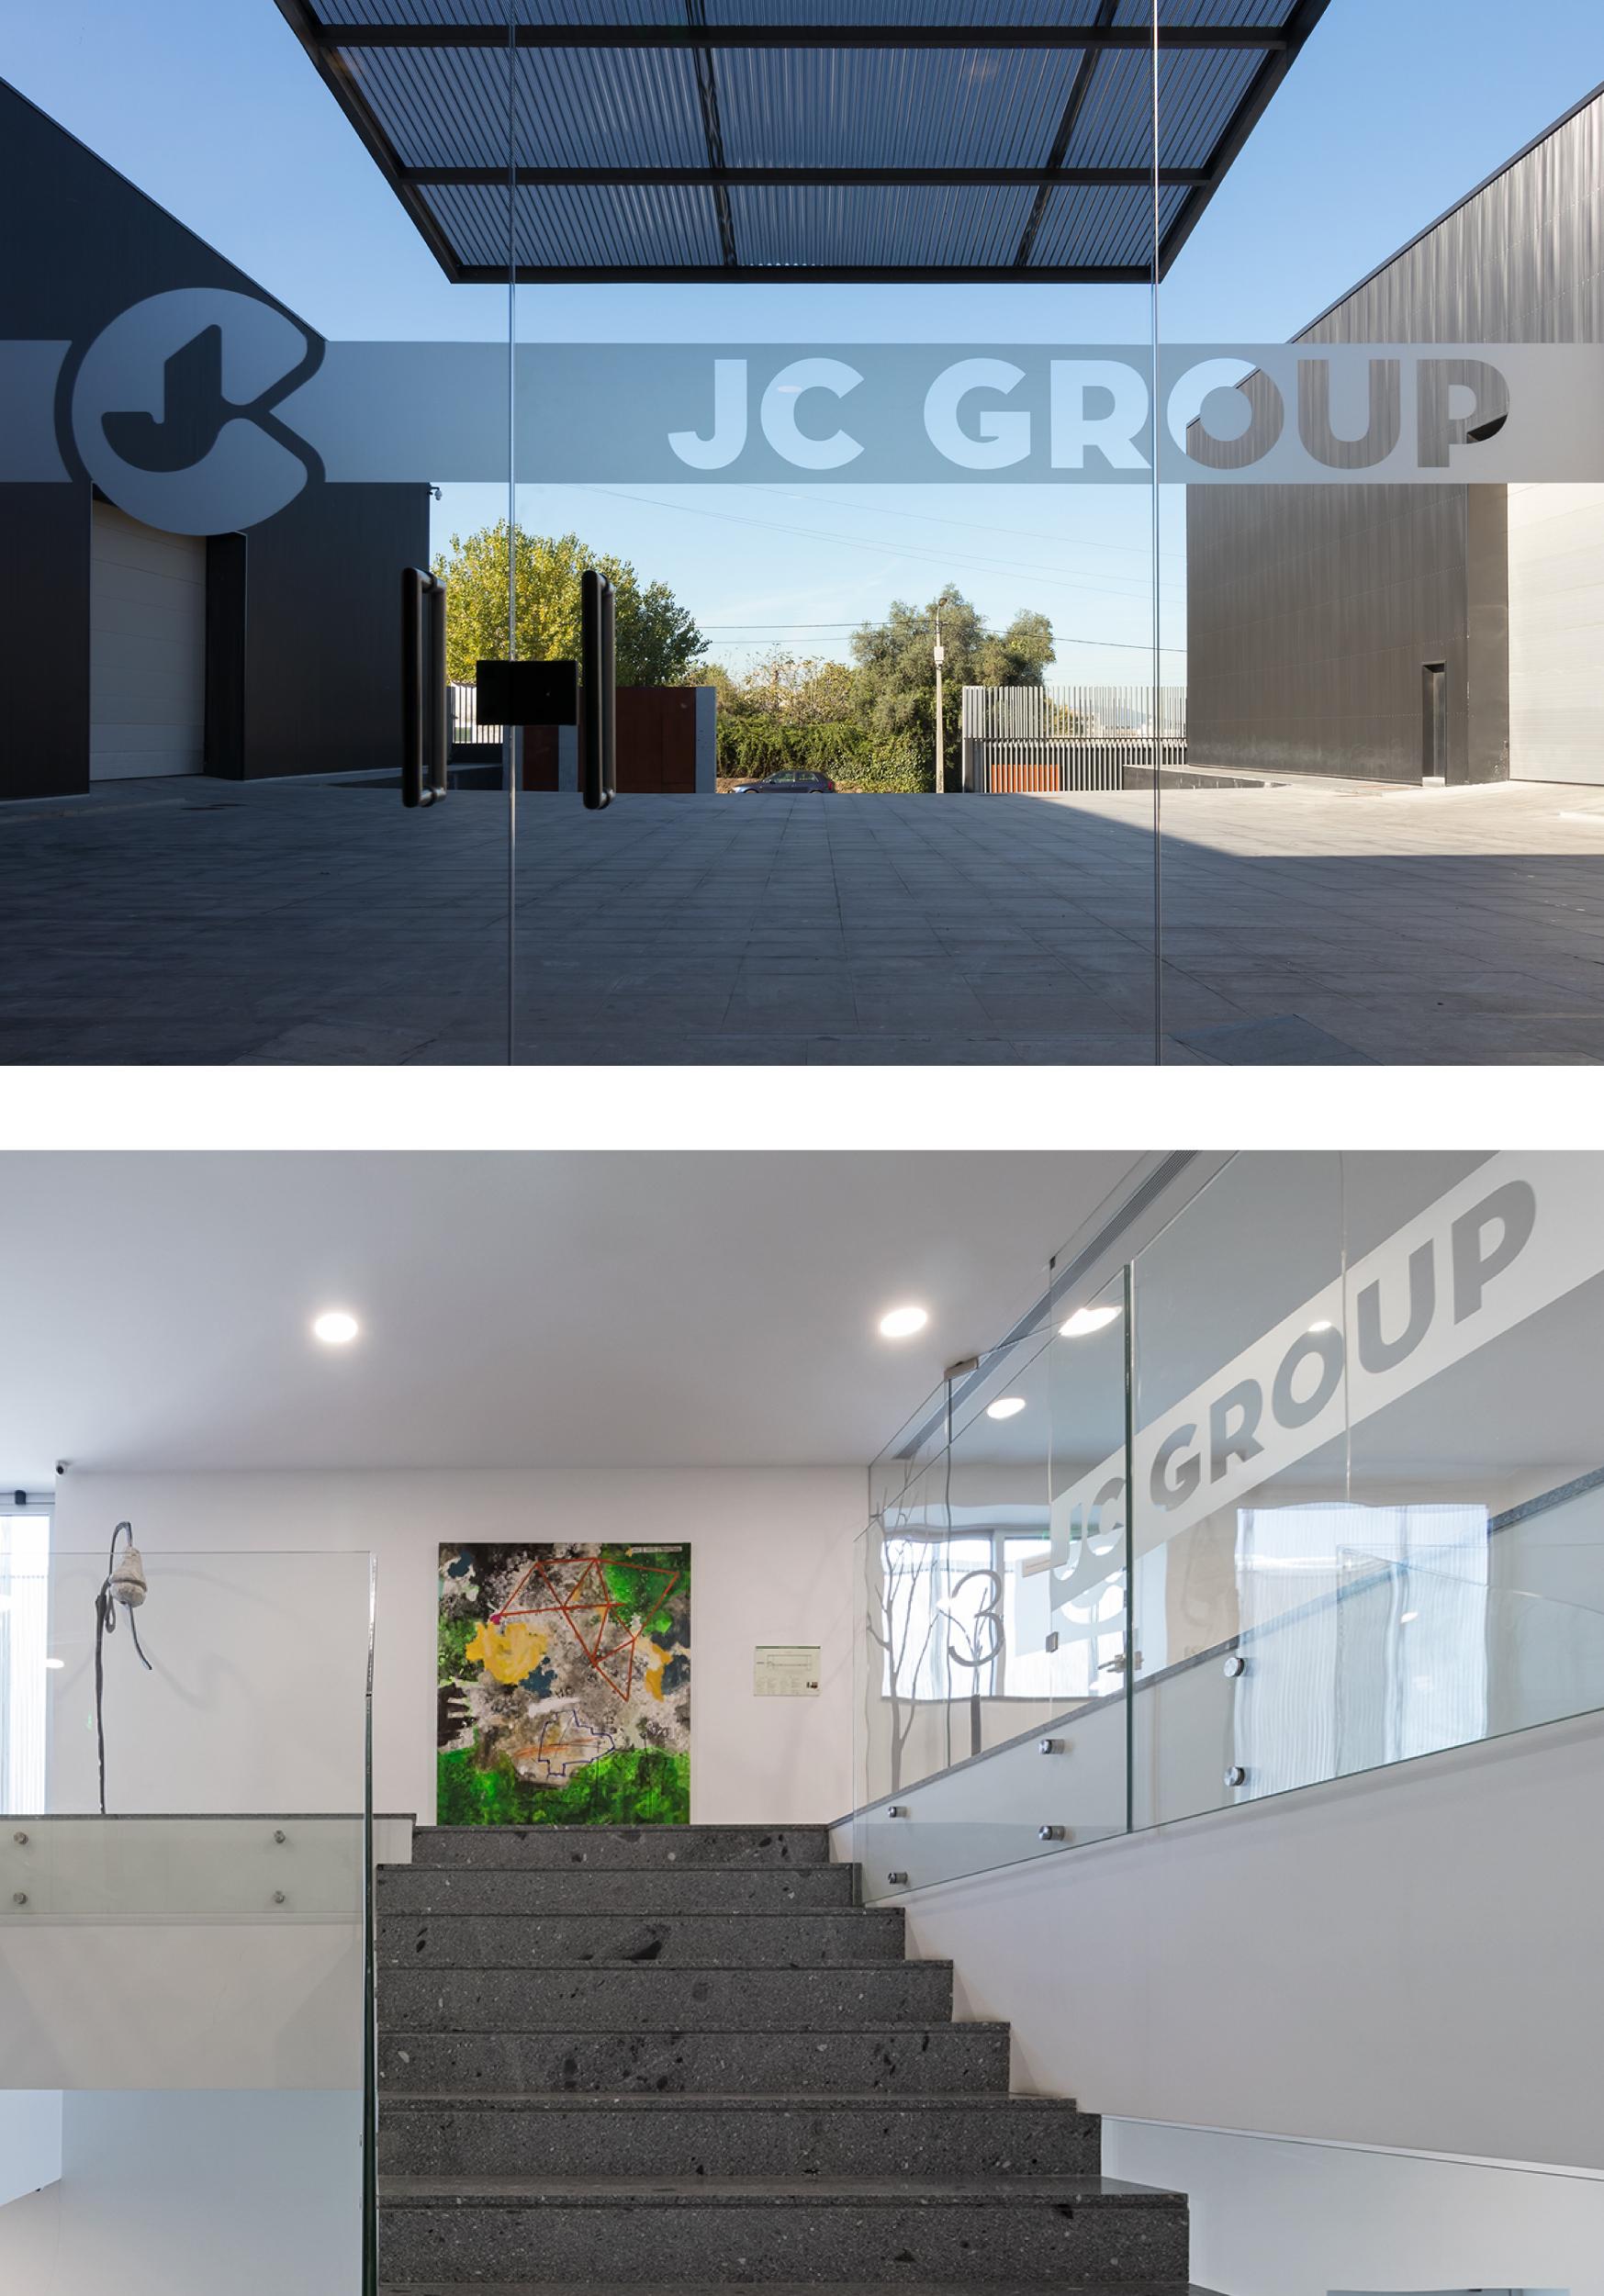 JC Group France triplicou obras em três anos